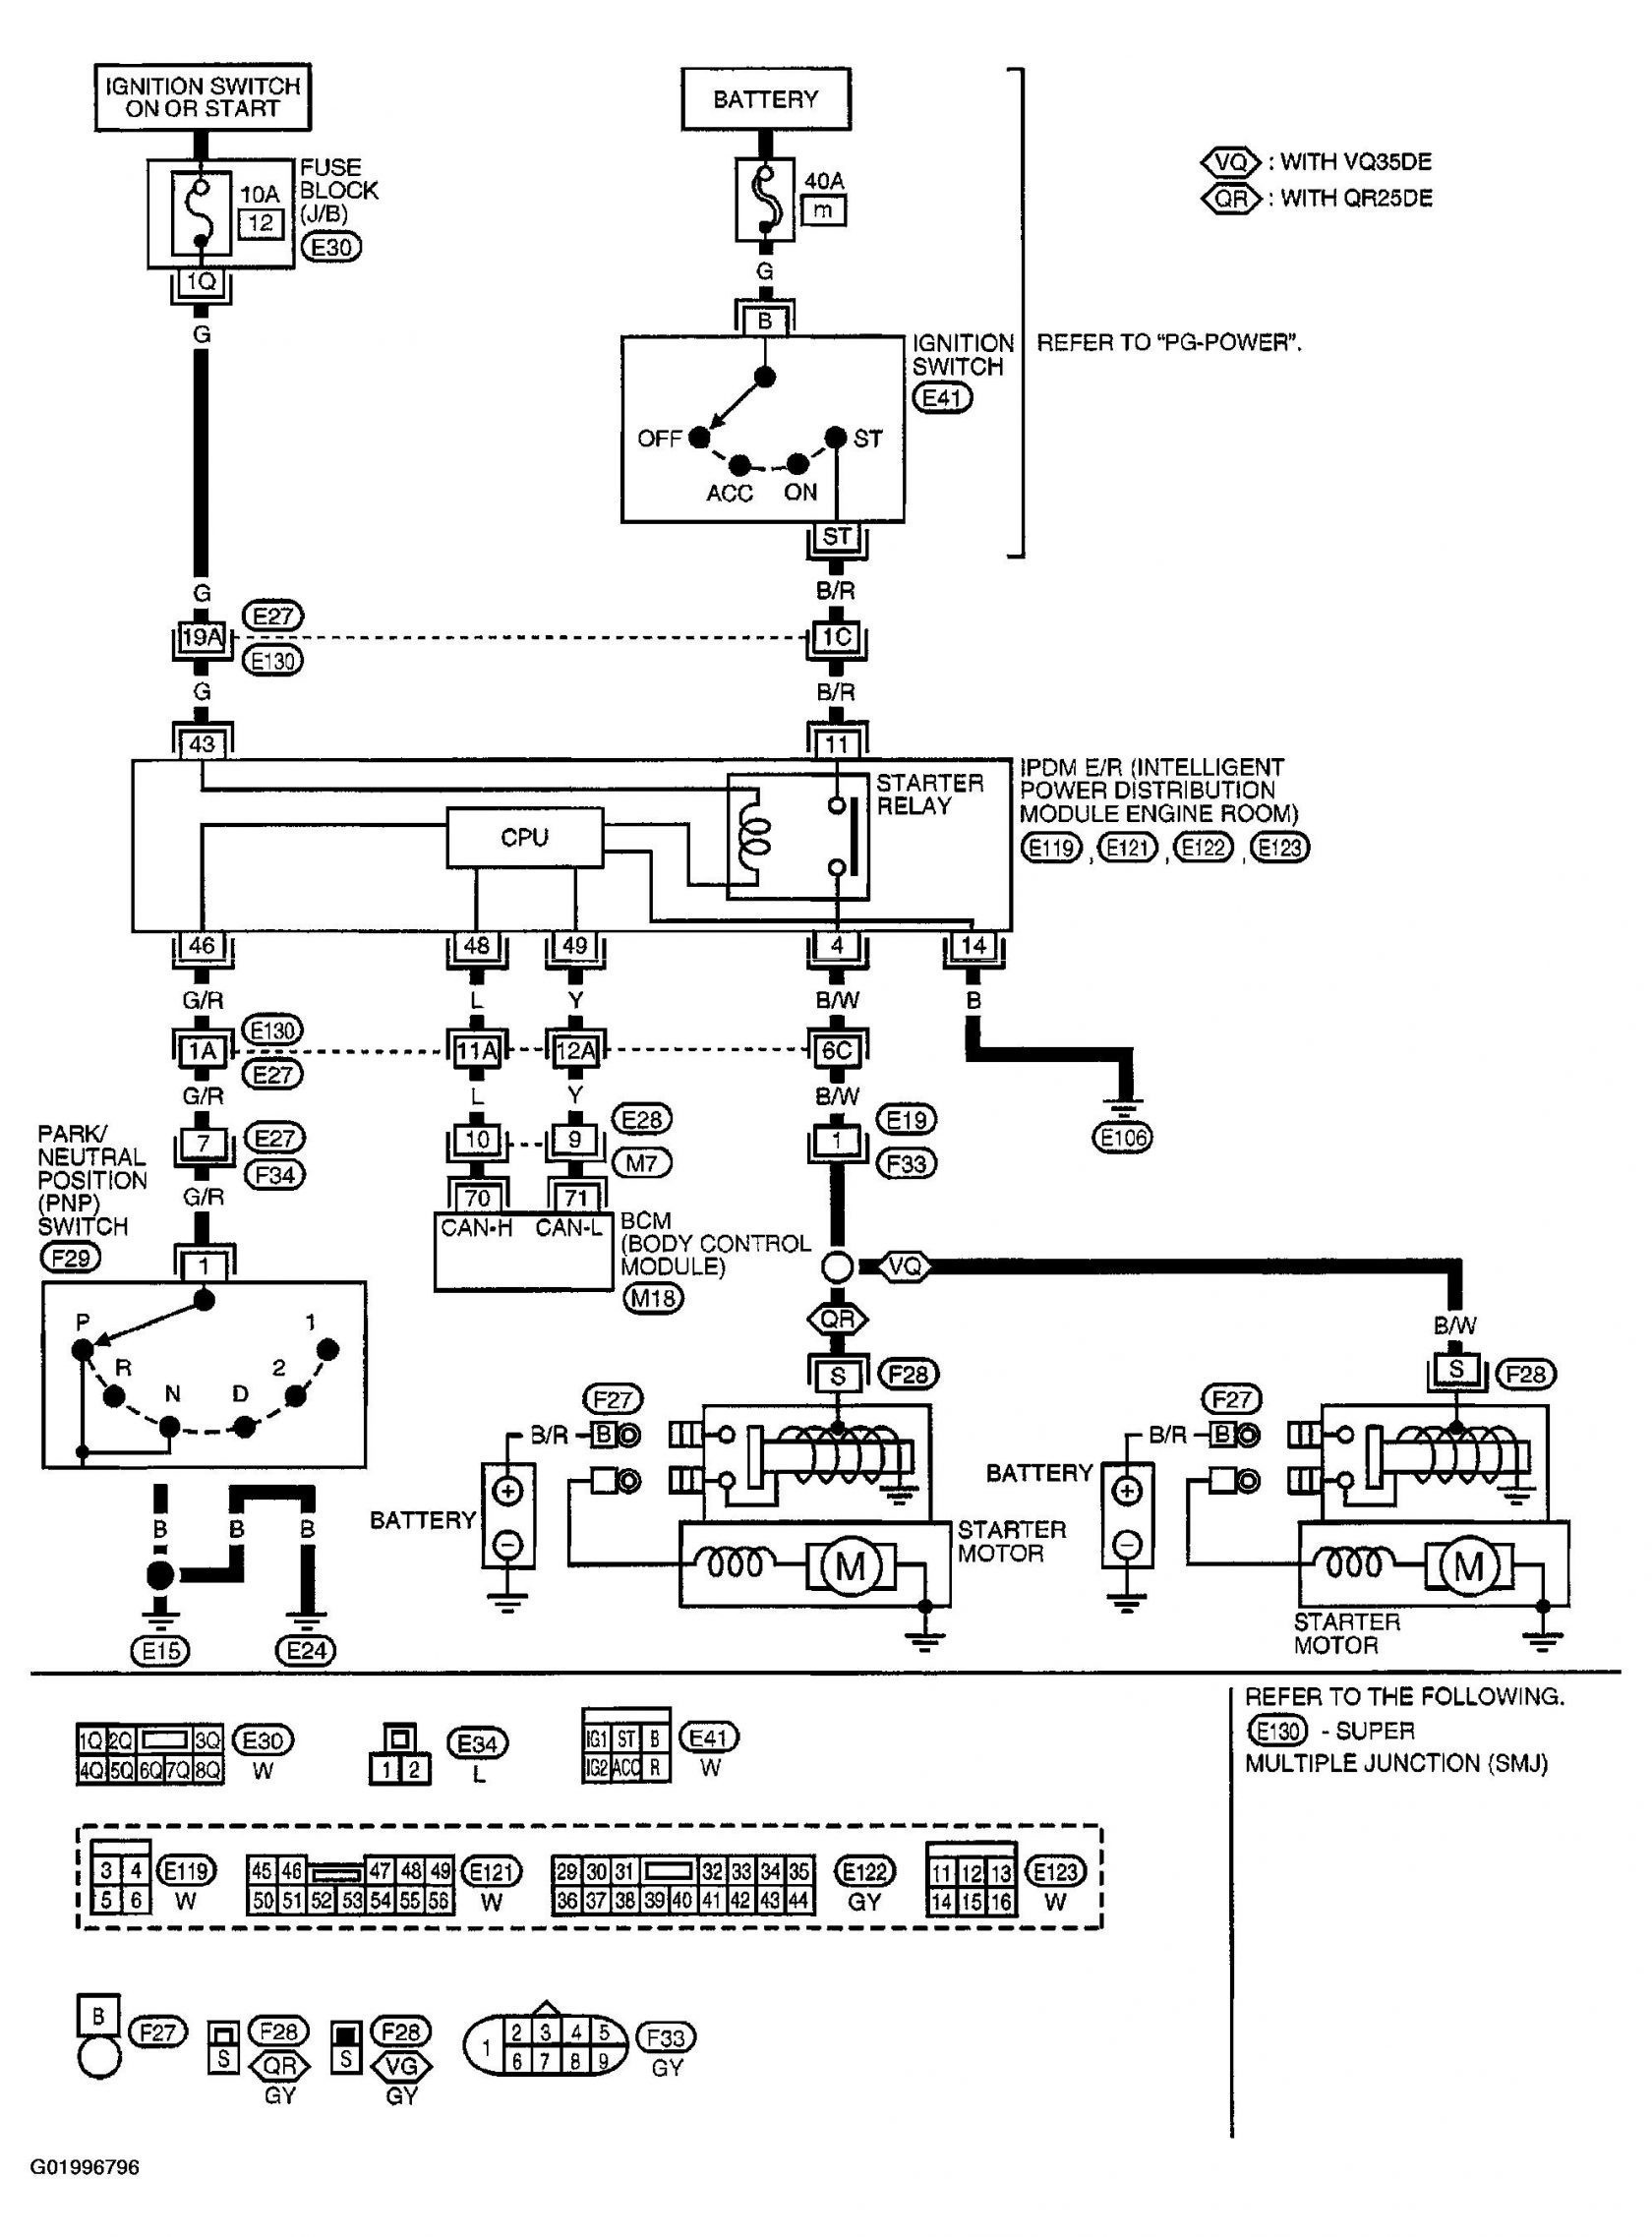 2002 Nissan Pathfinder Engine Diagram Nissan Navara D22 Radio Wiring Diagram Shahsramblings Of 2002 Nissan Pathfinder Engine Diagram